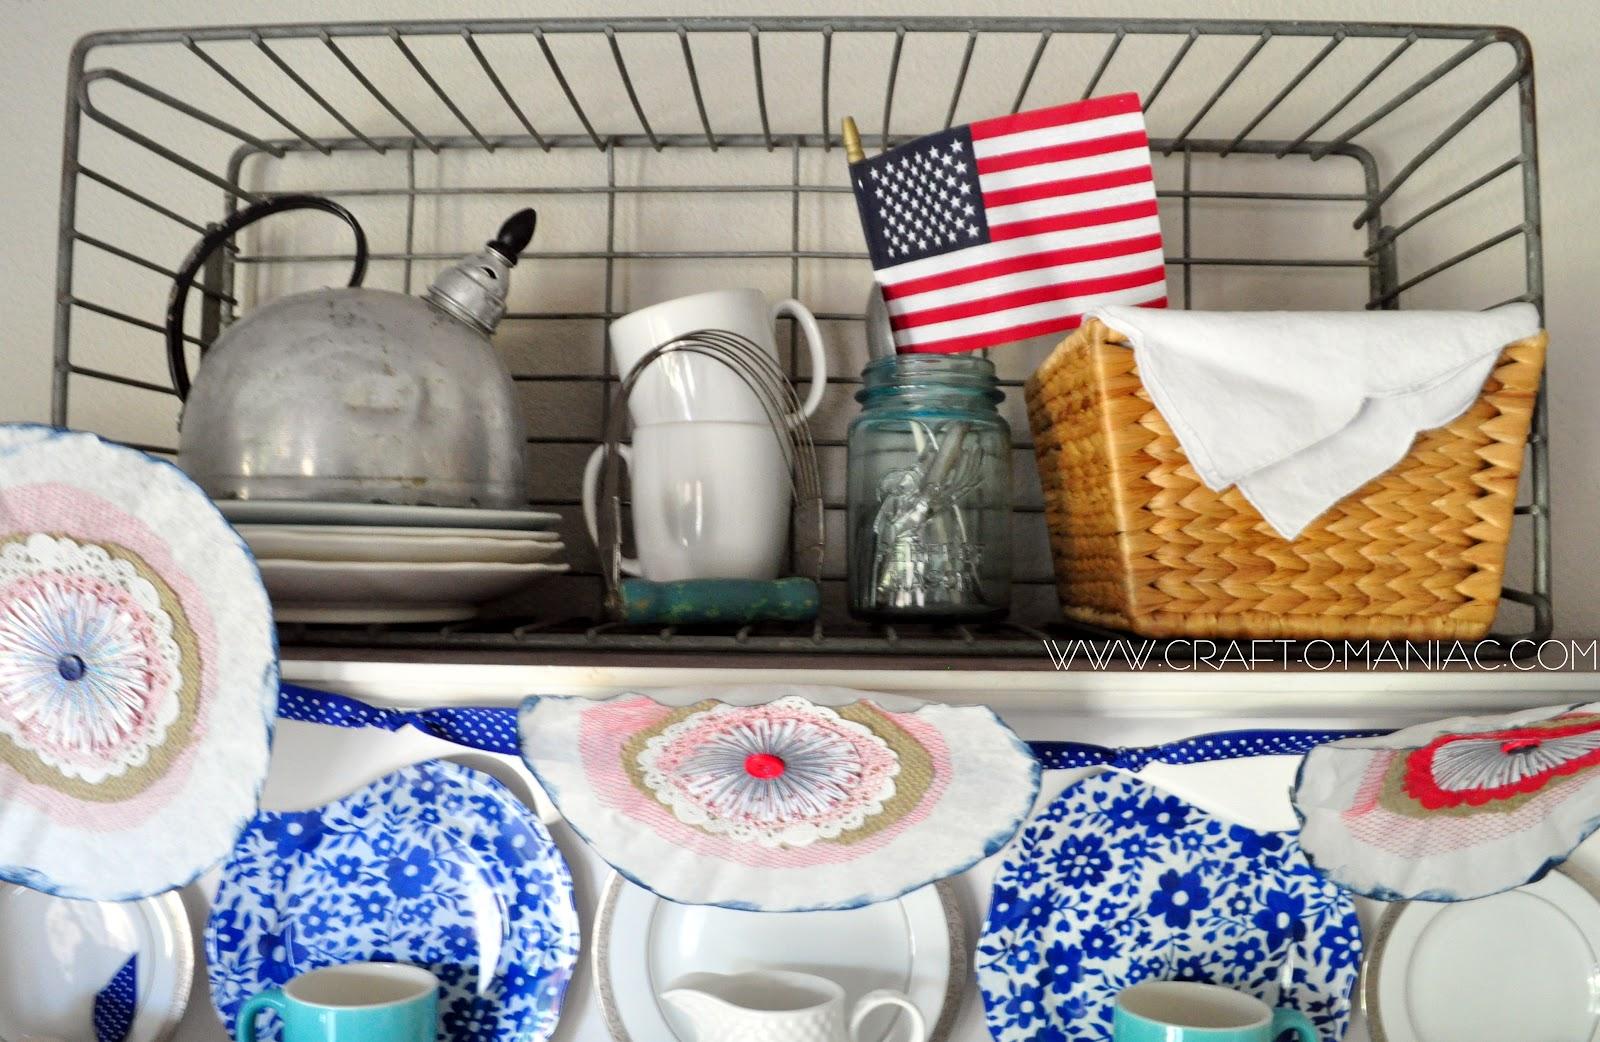 Patriotic Decor For Home: Home Decor A Patriotic Hutch